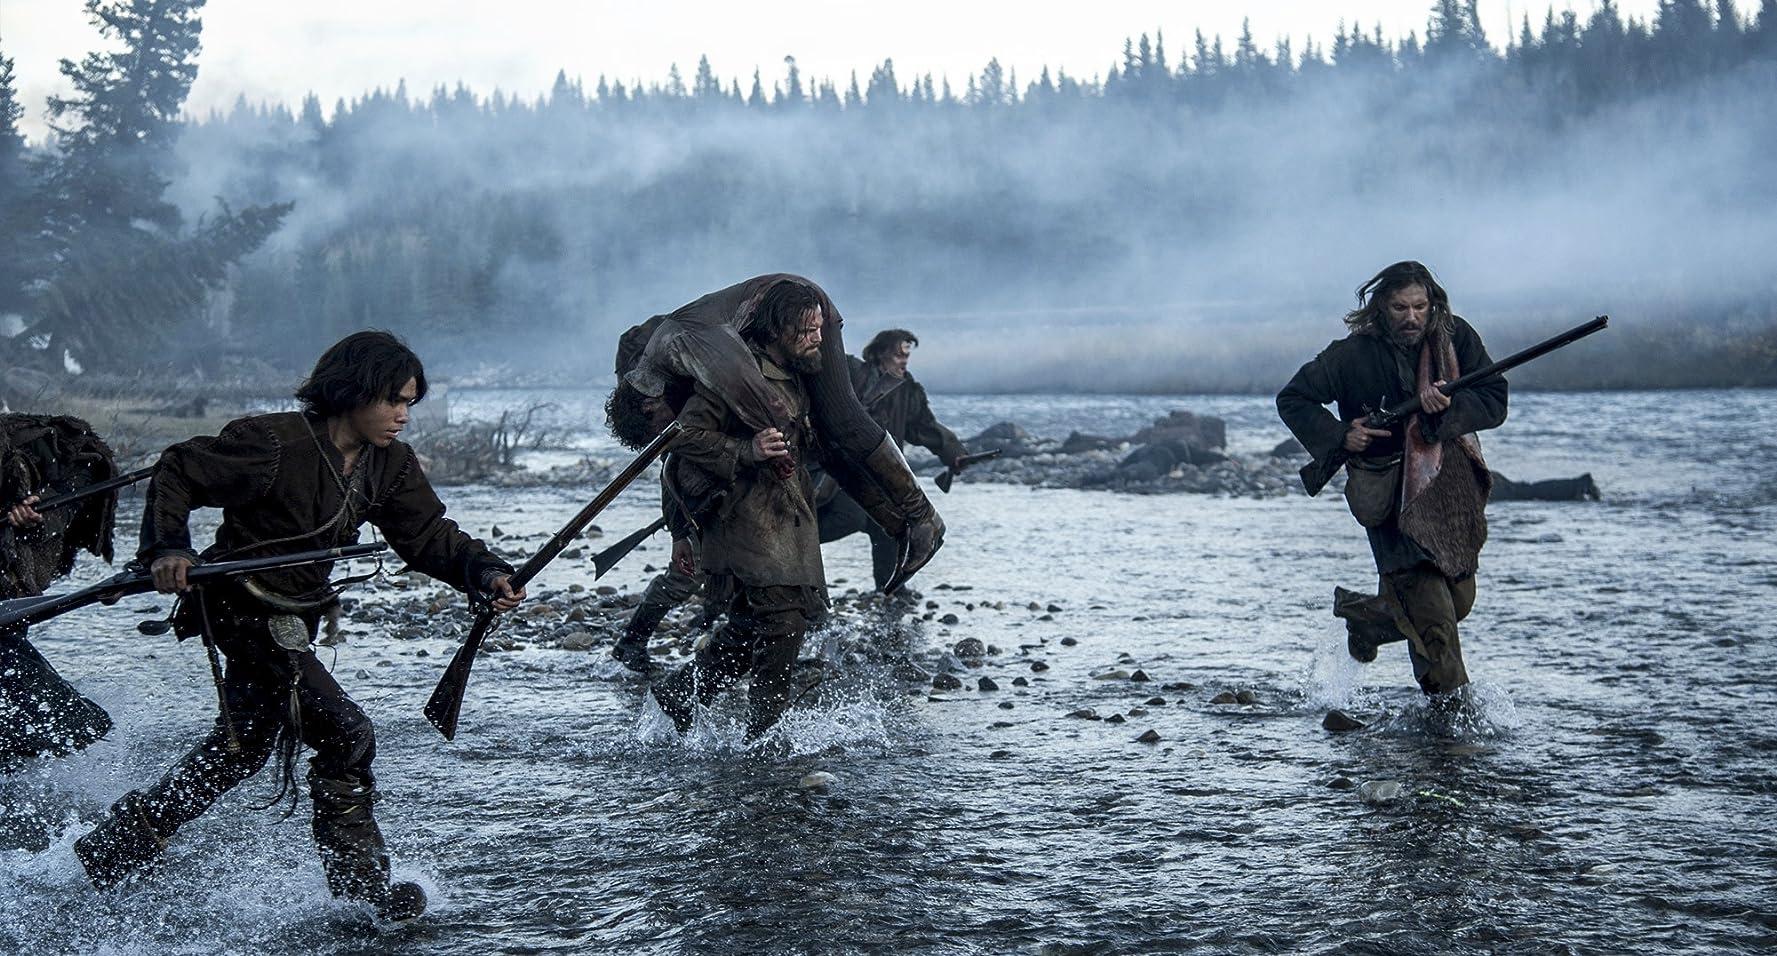 Leonardo DiCaprio and Forrest Goodluck in The Revenant (2015)